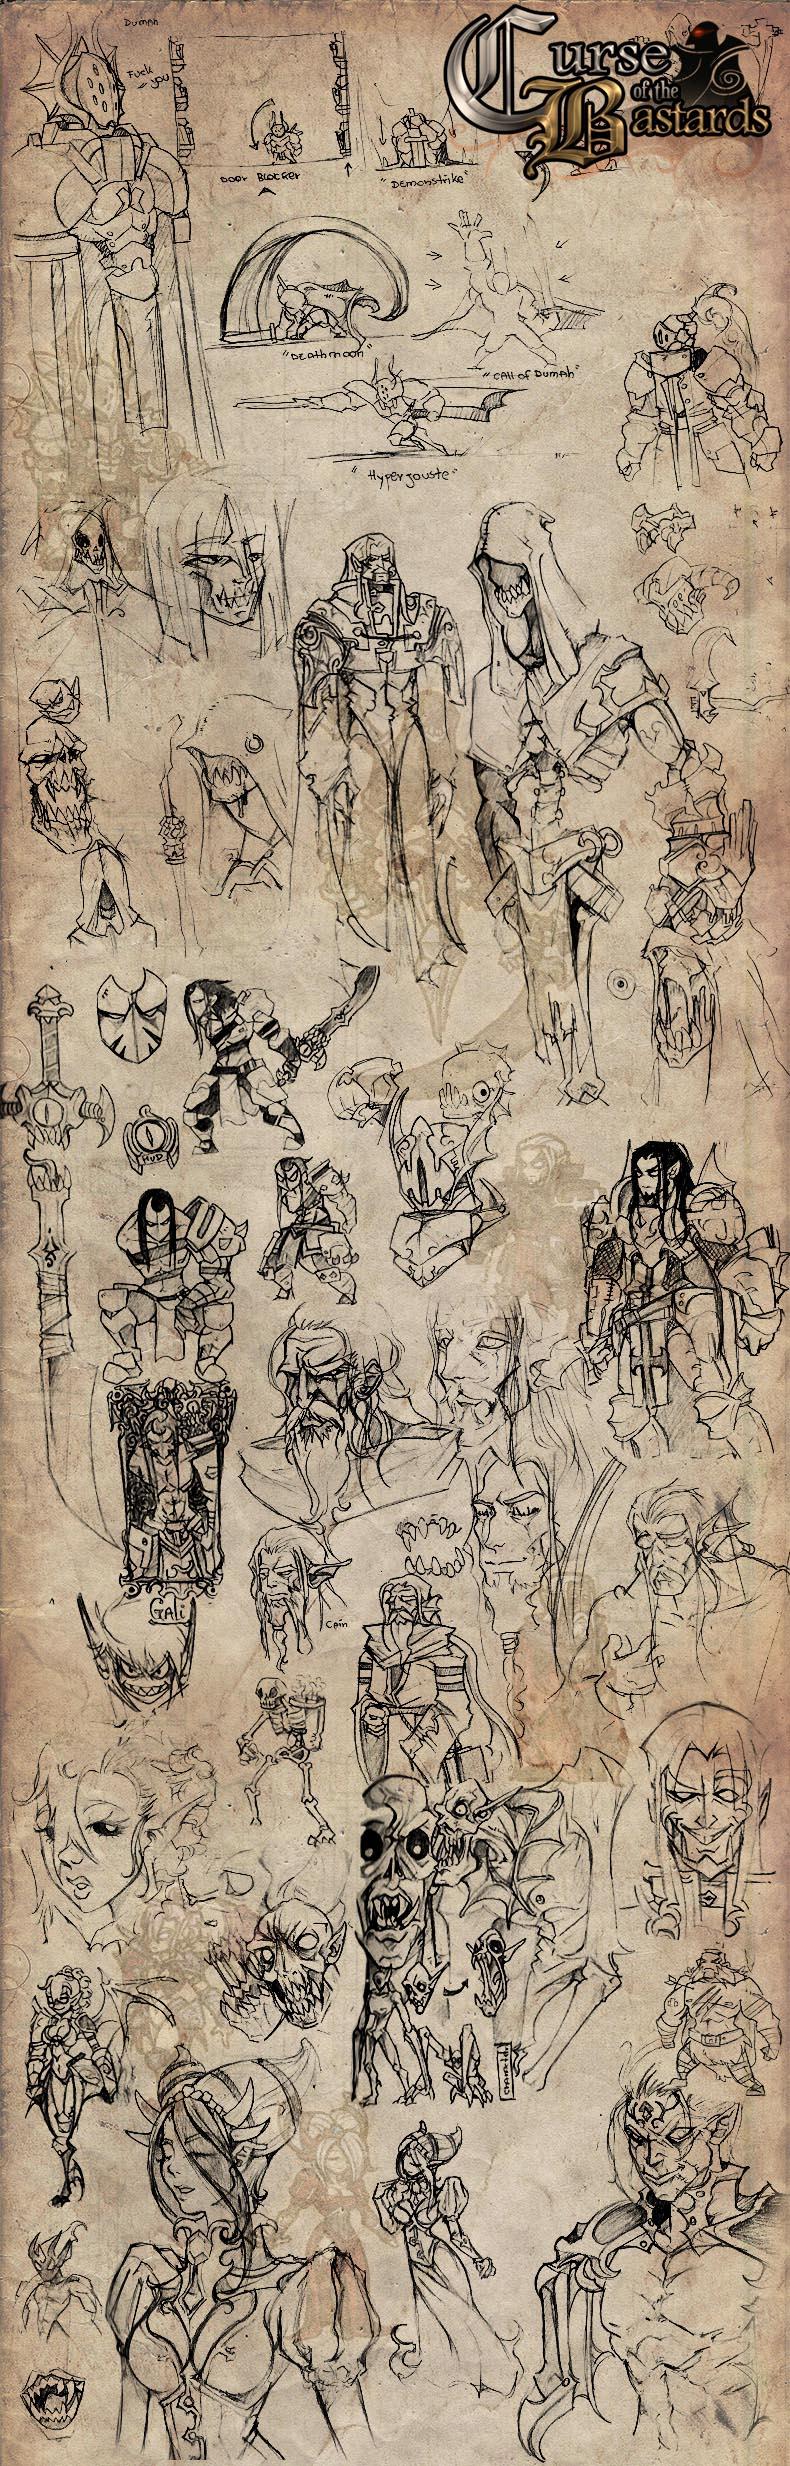 Curse of the Bastards - Sketch